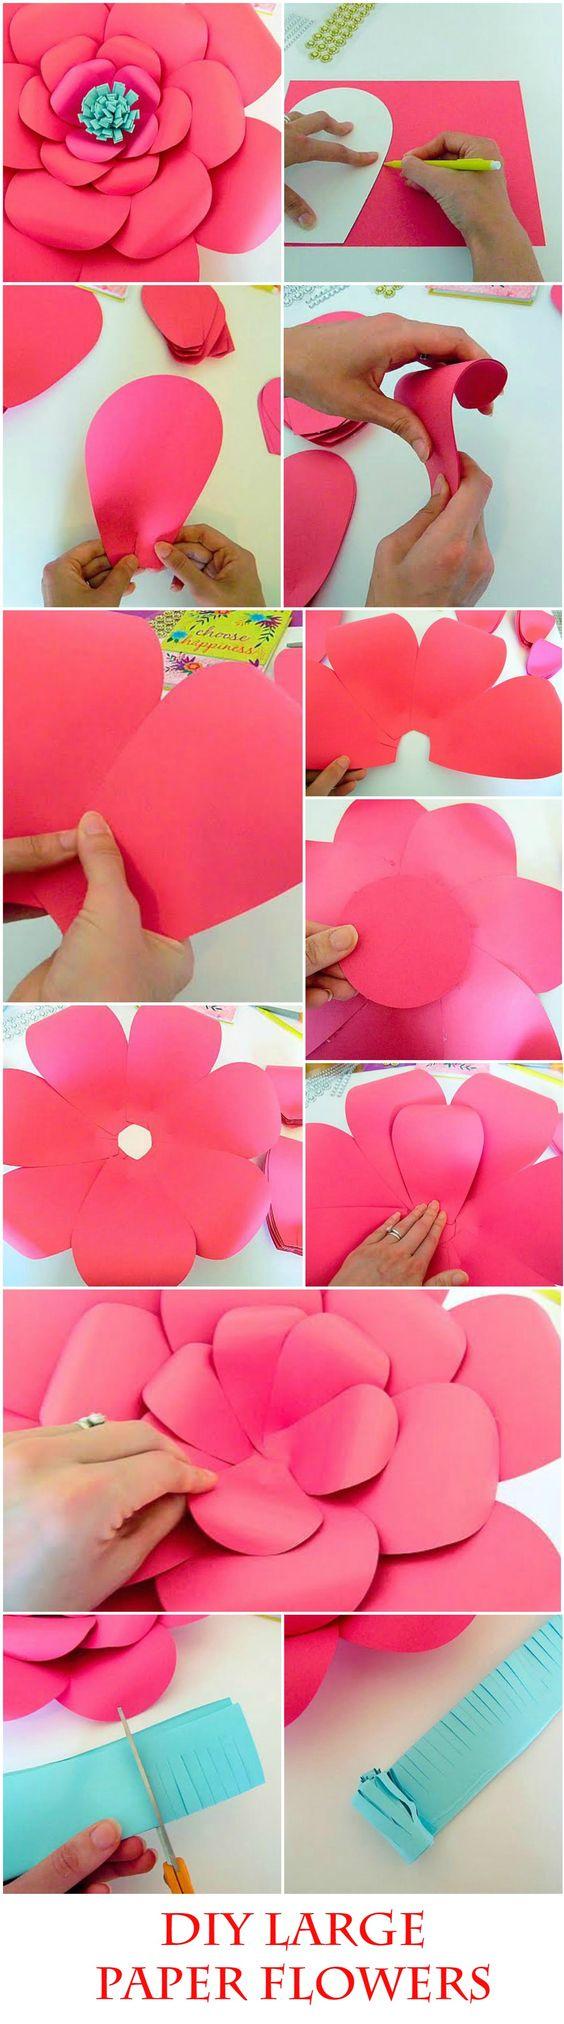 DIY Giant Paper flower templates & tutorial, DIY Paper flower making kit, SVG Paper flower cutting files, Large Backdrop flowers: